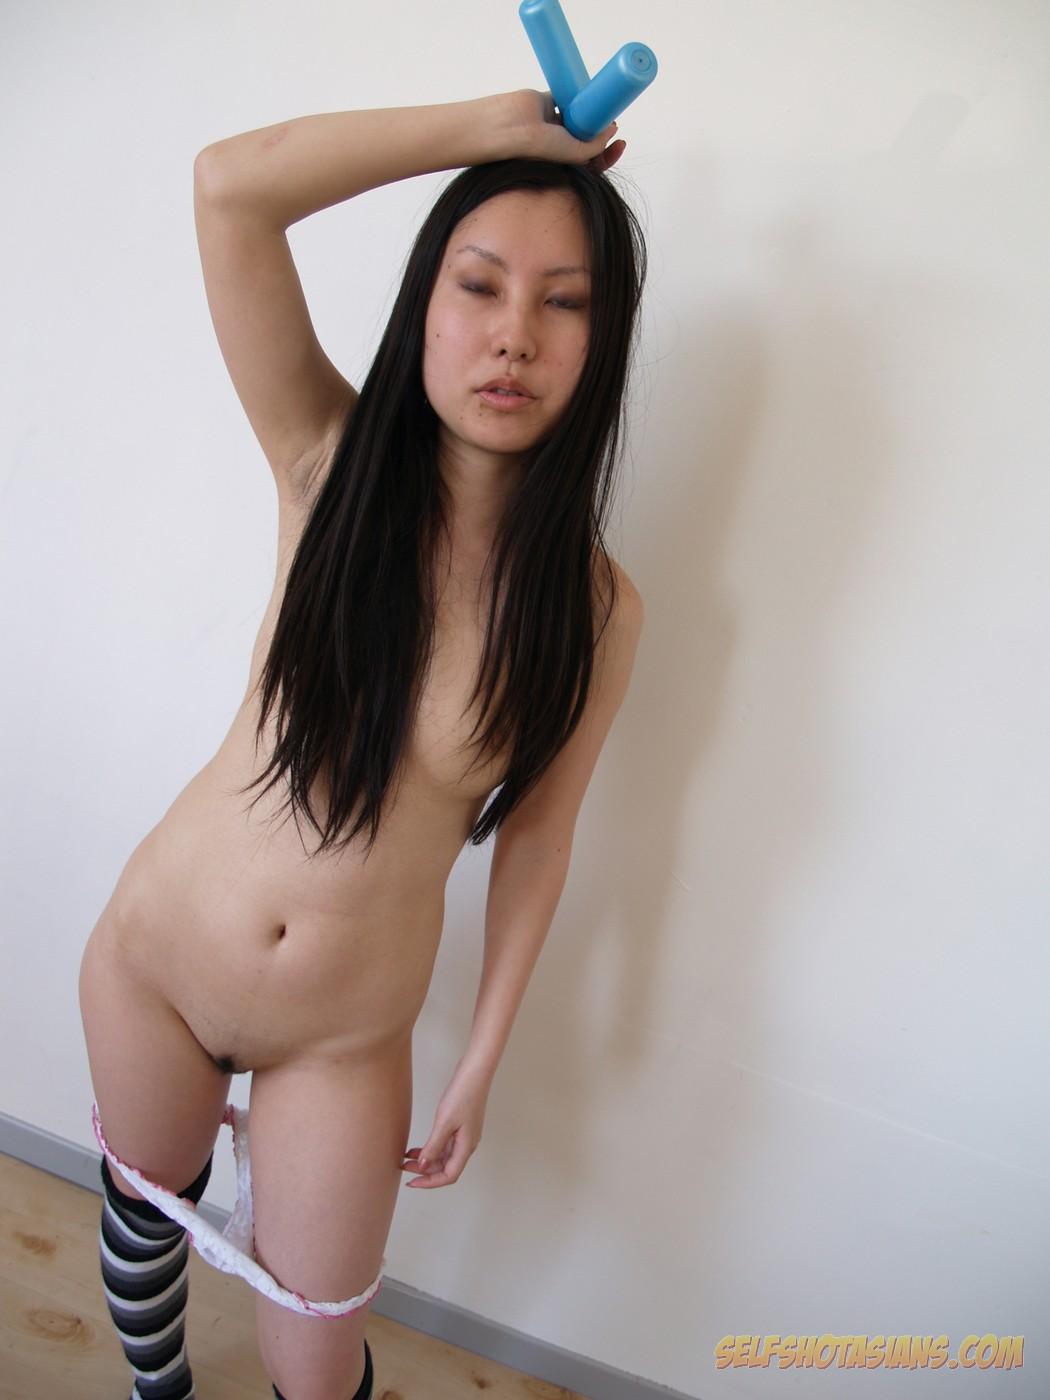 jayma reid boobs